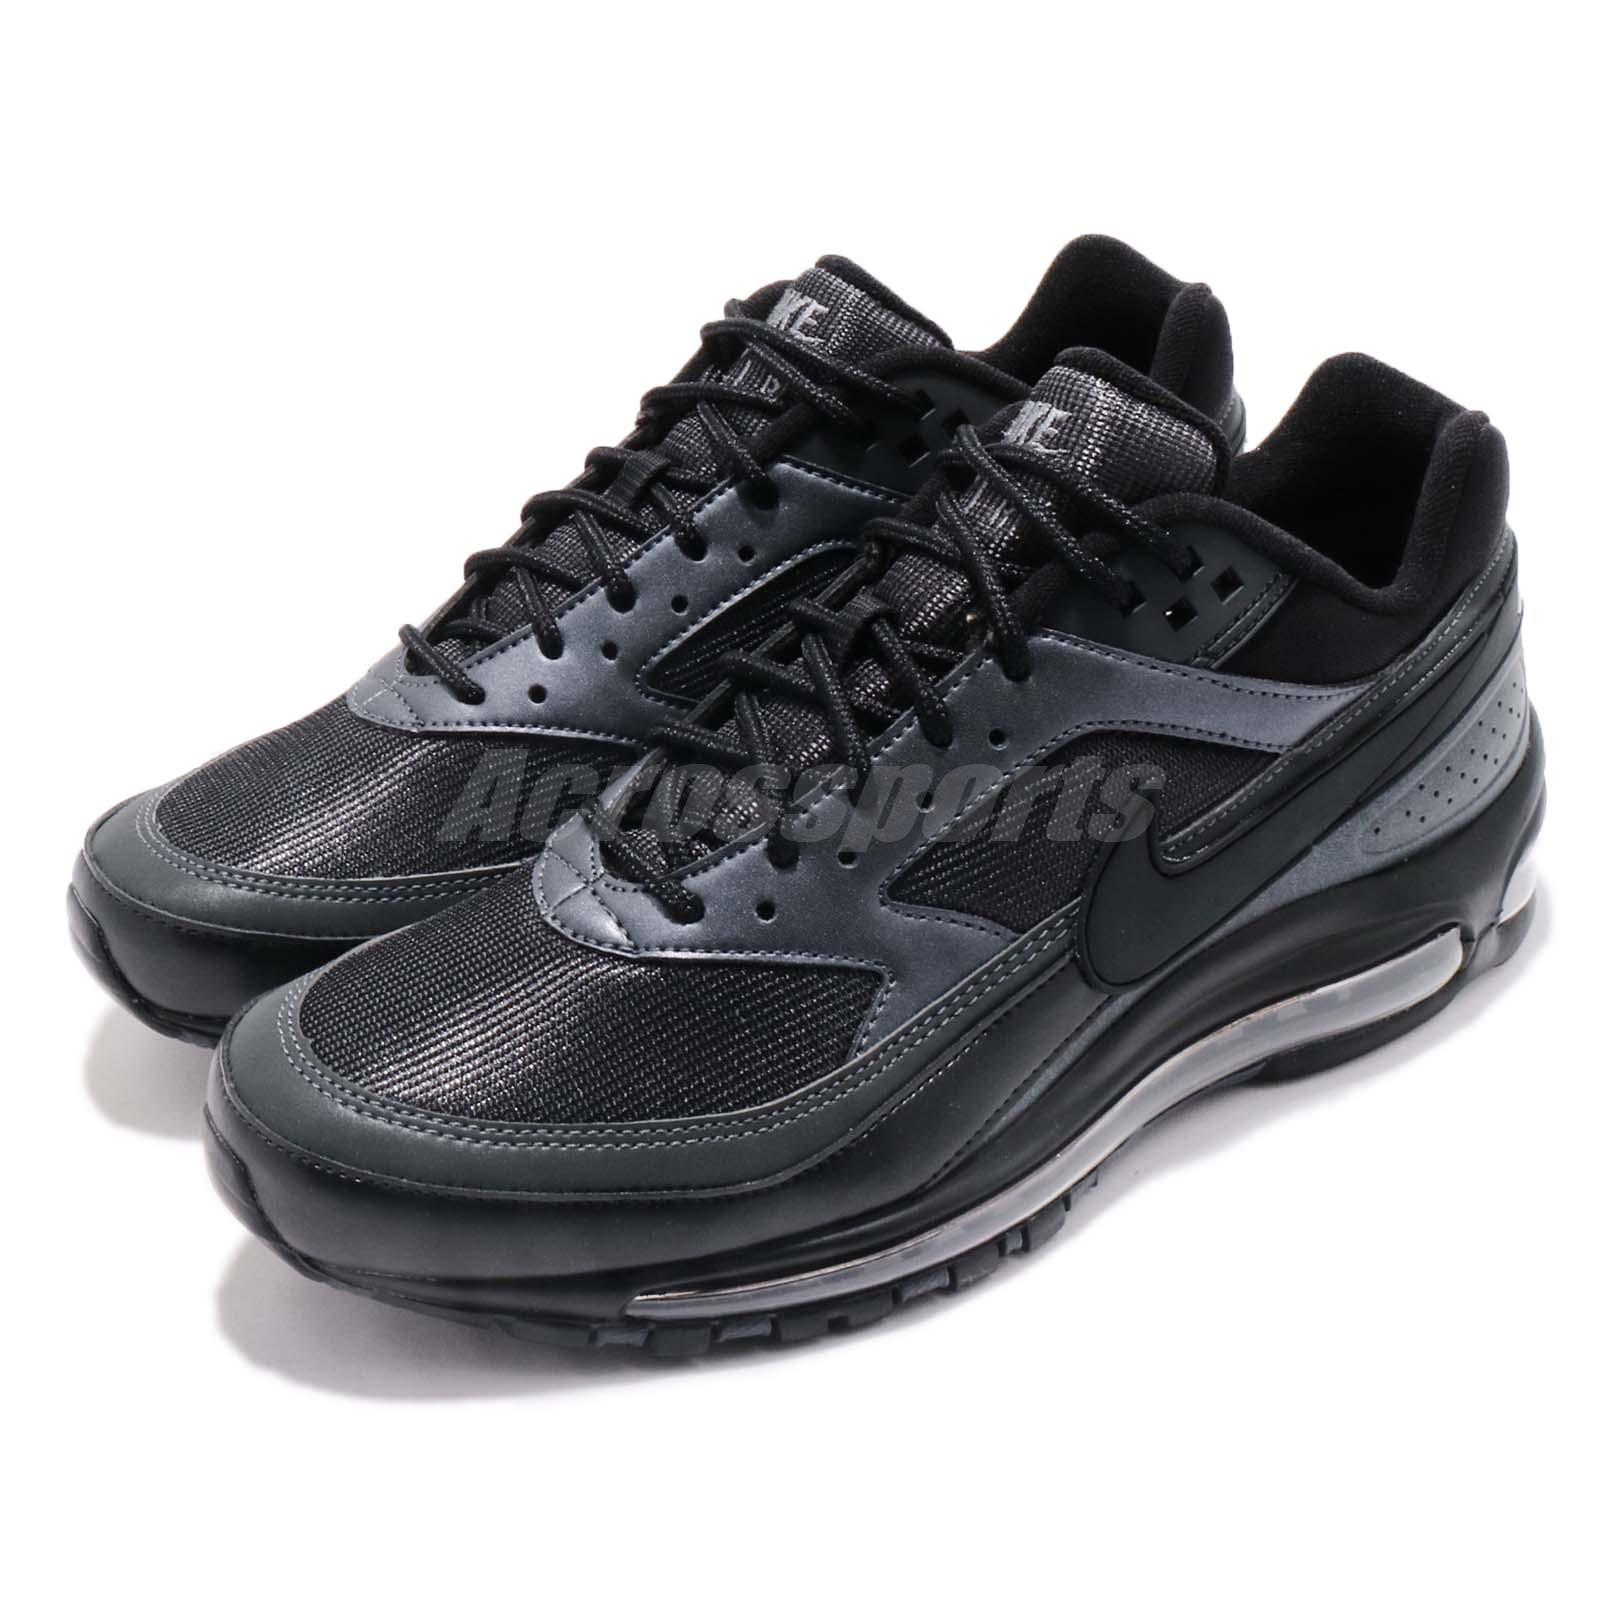 Detalles acerca de Nike Max 97 BW Negro Metálico Air Hematites reflejan Men Running Shoes AO2406 001 mostrar título original